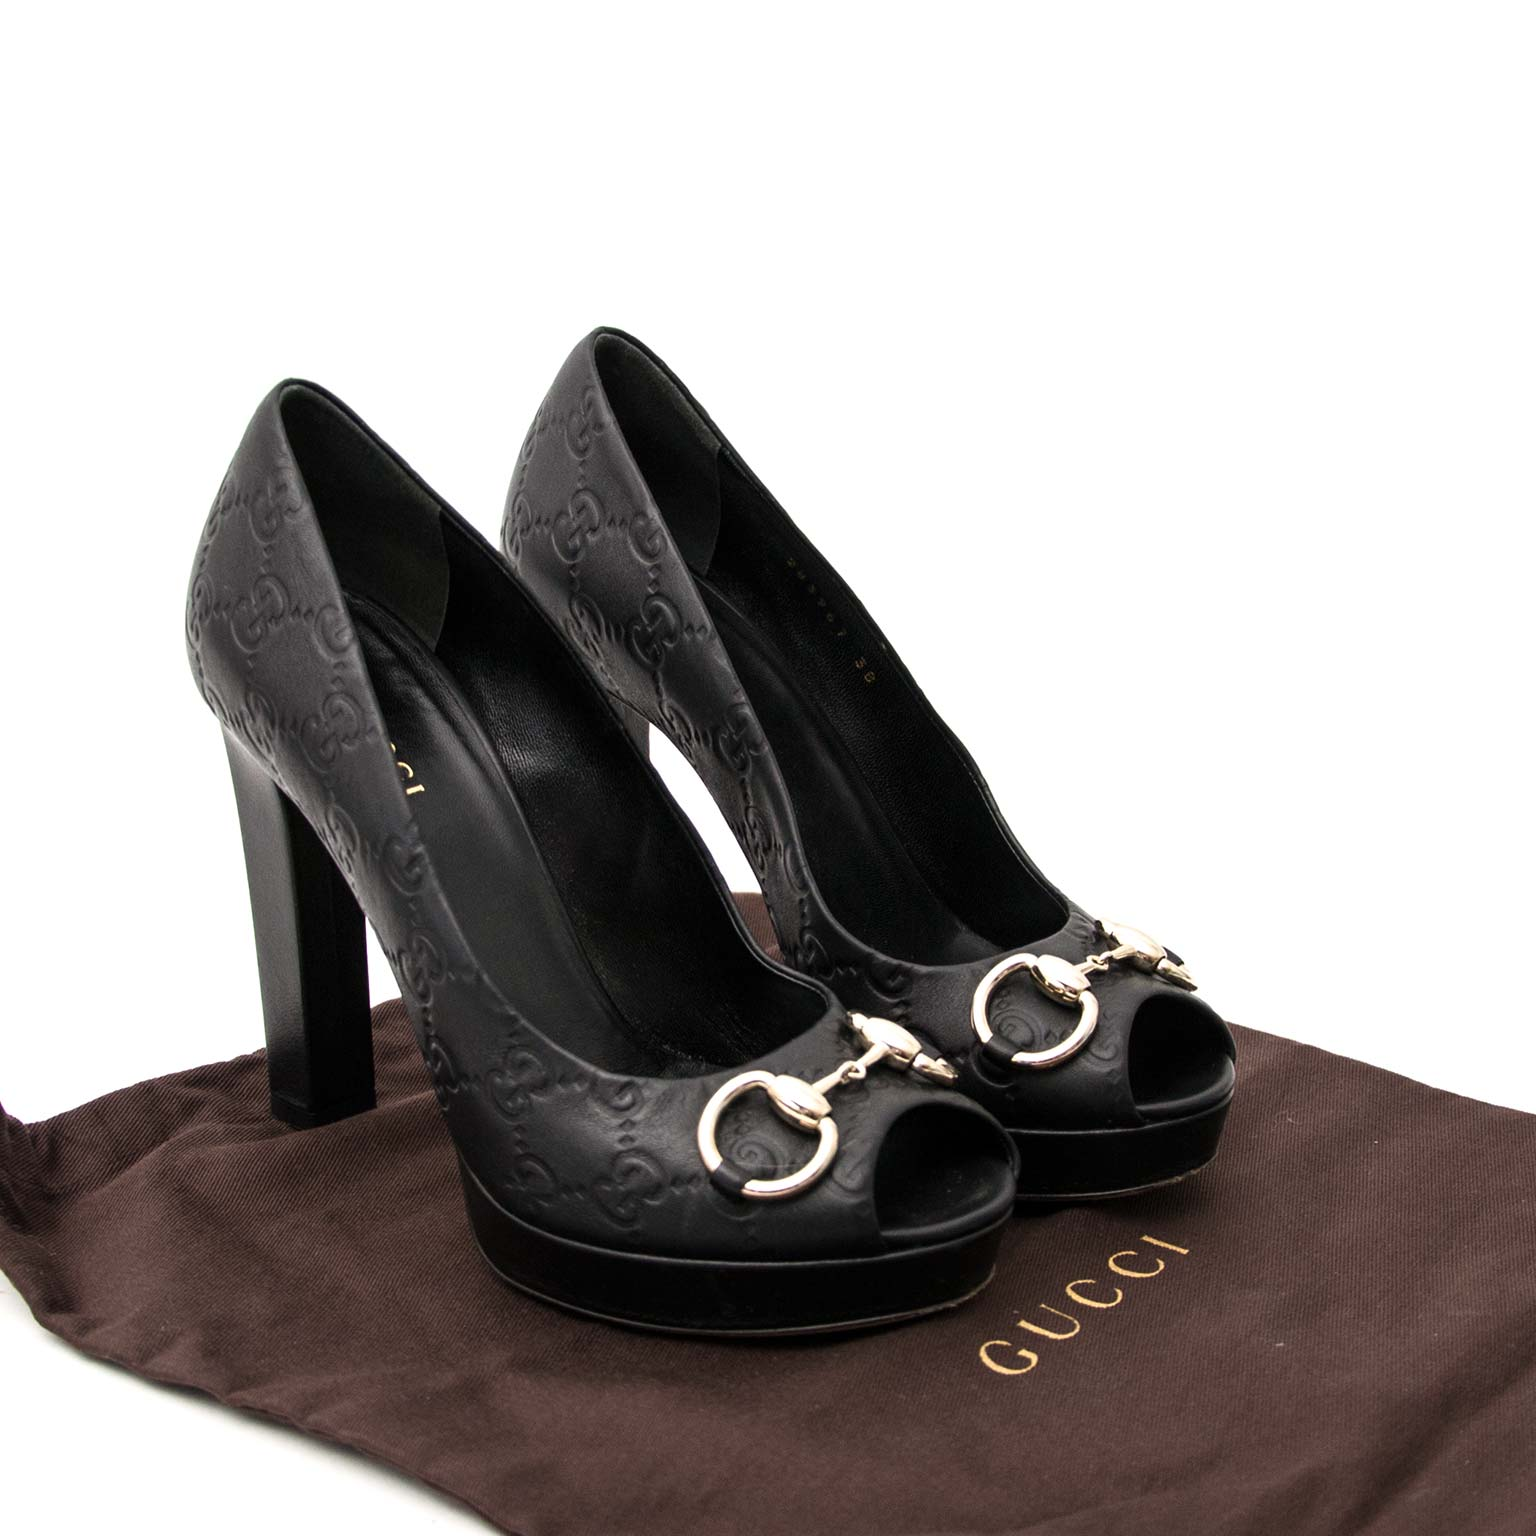 Gucci Horsebit Logo Embossed Peep-Toe Pump - size 38